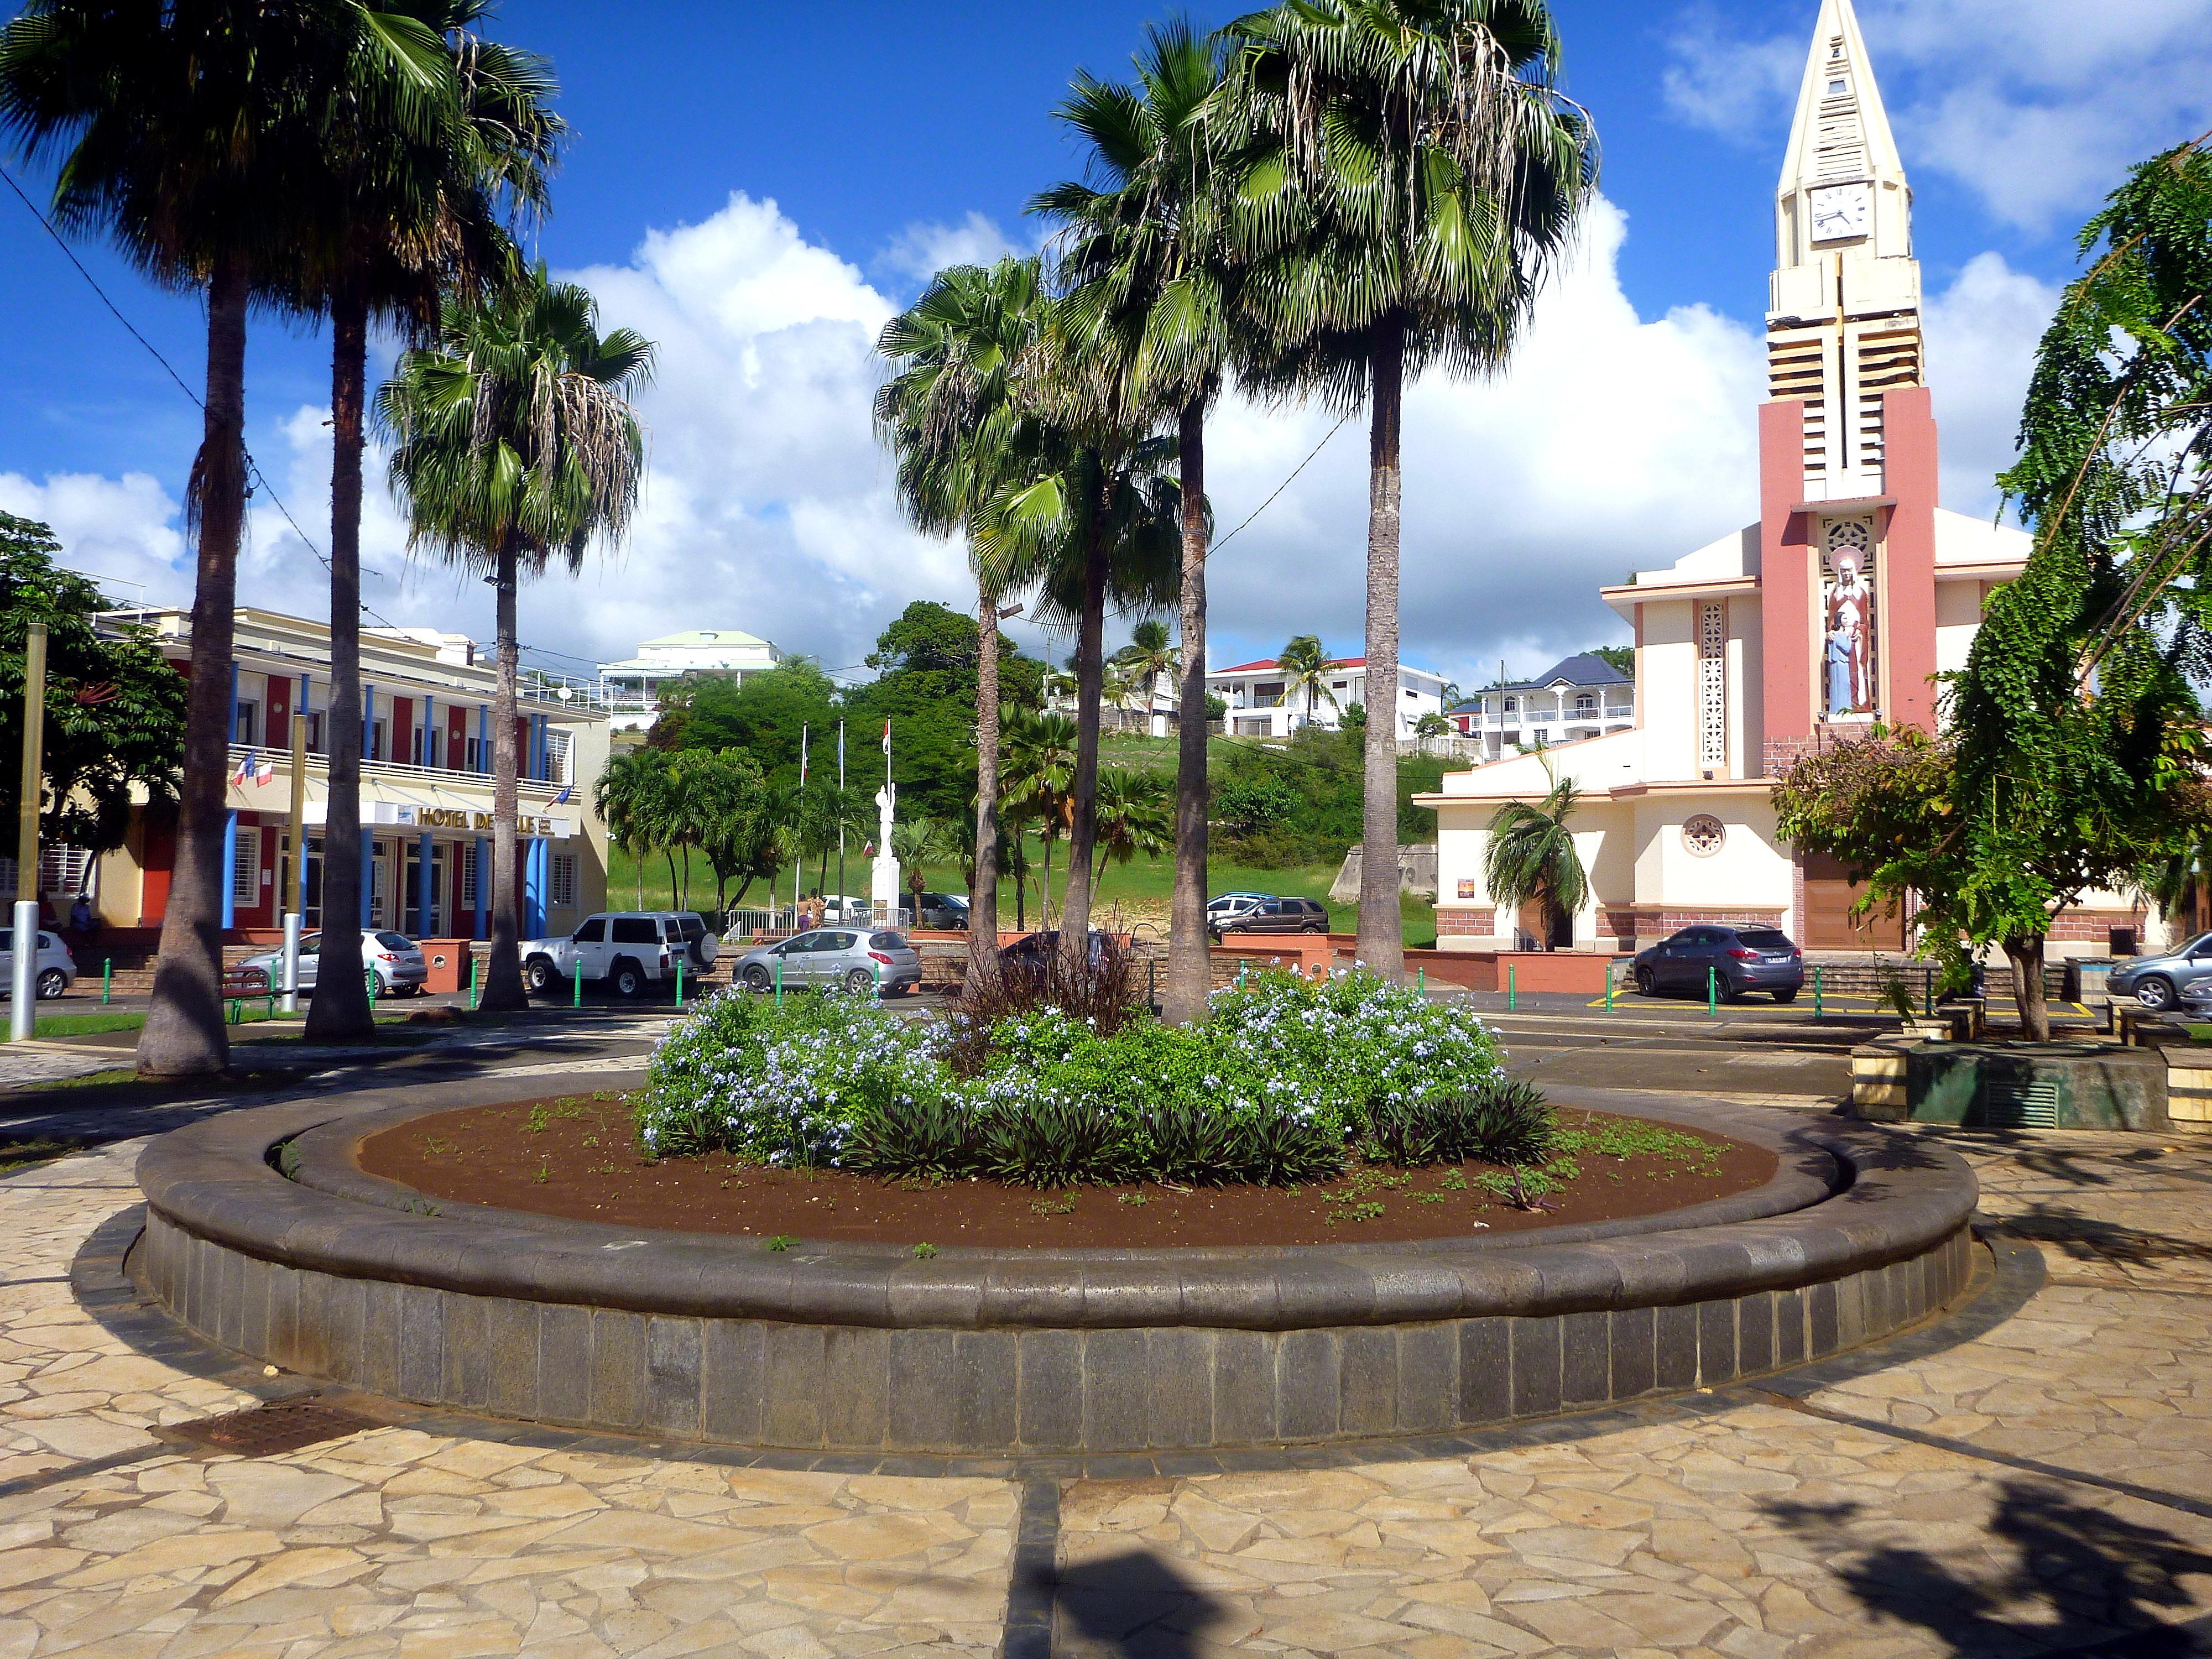 Anoli Location_Place de l'hotel de ville_Sainte Anne Guadeloupejpg